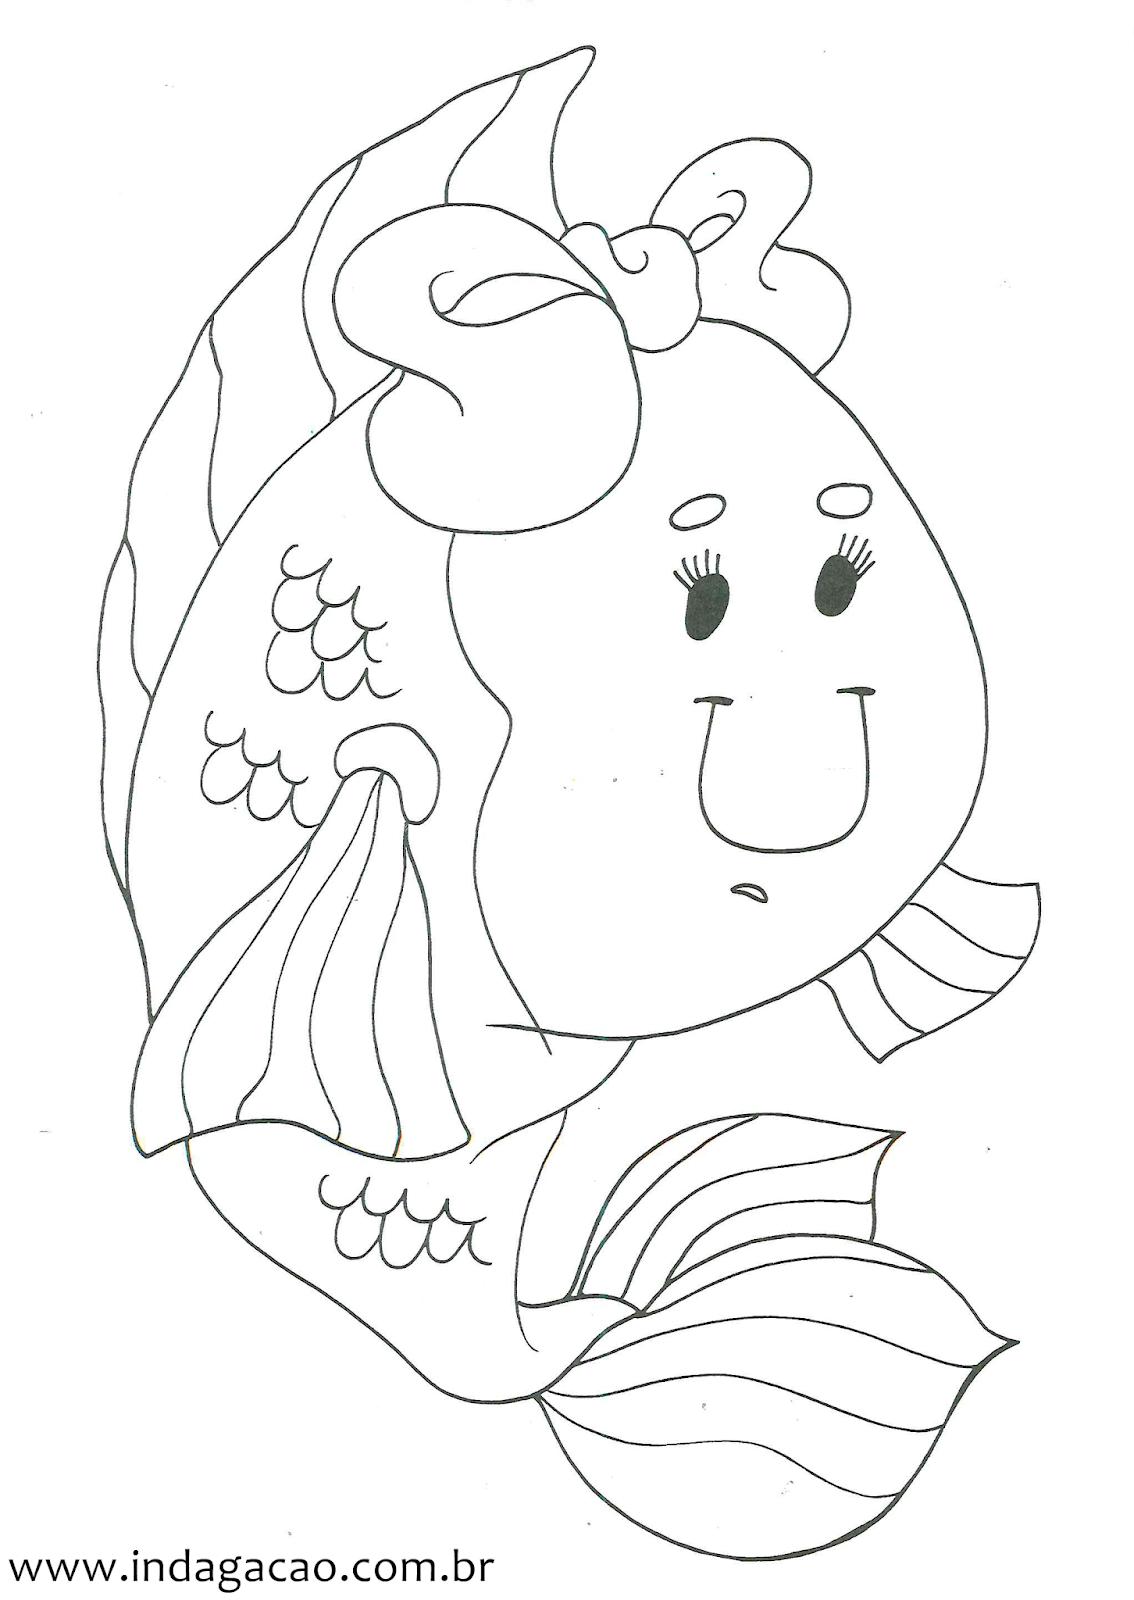 Desenho De Peixe Para Colorir Indagacao